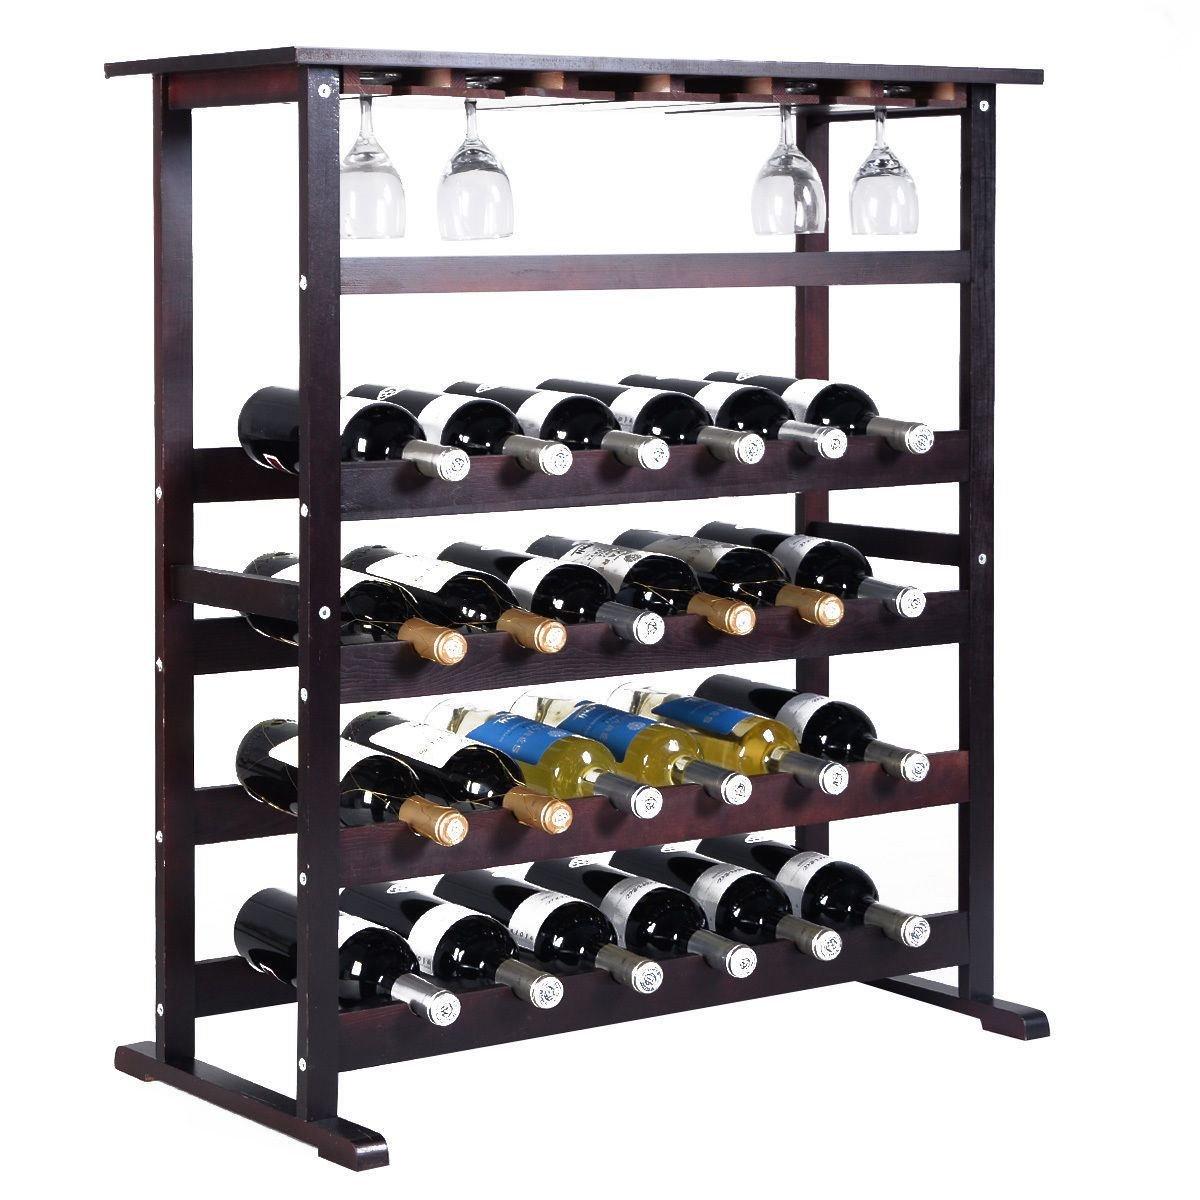 MasterPanel - 24 Bottle Wood Wine Rack Holder Storage Shelf Display w/ Glass Hanger #TP3357